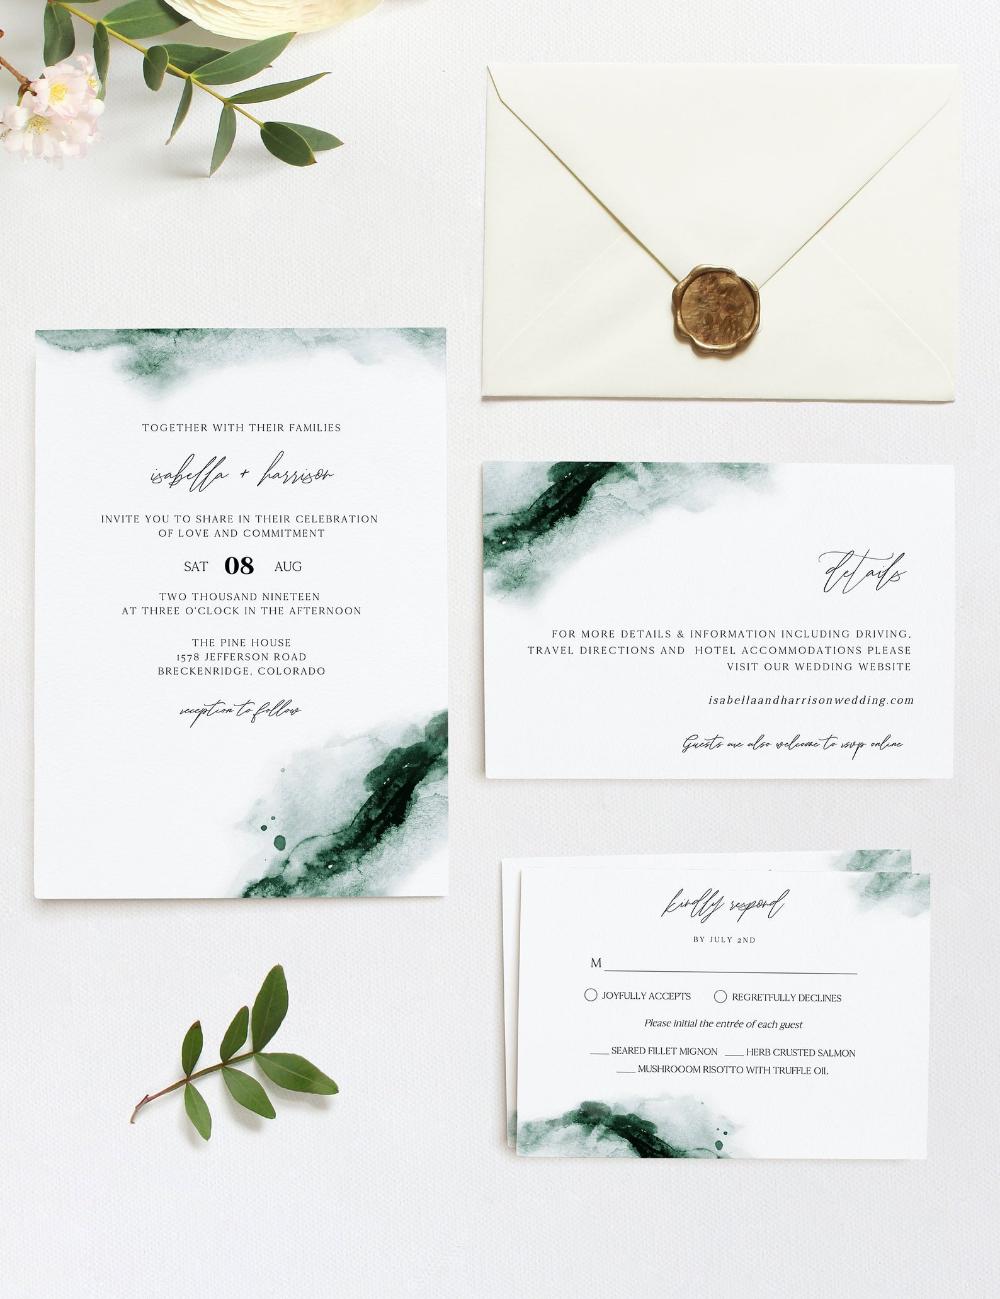 Emerald Green Watercolor Wedding Invitation Template Suite Etsy Emerald Wedding Invitations Jewel Tone Wedding Invitations Watercolor Wedding Invitations